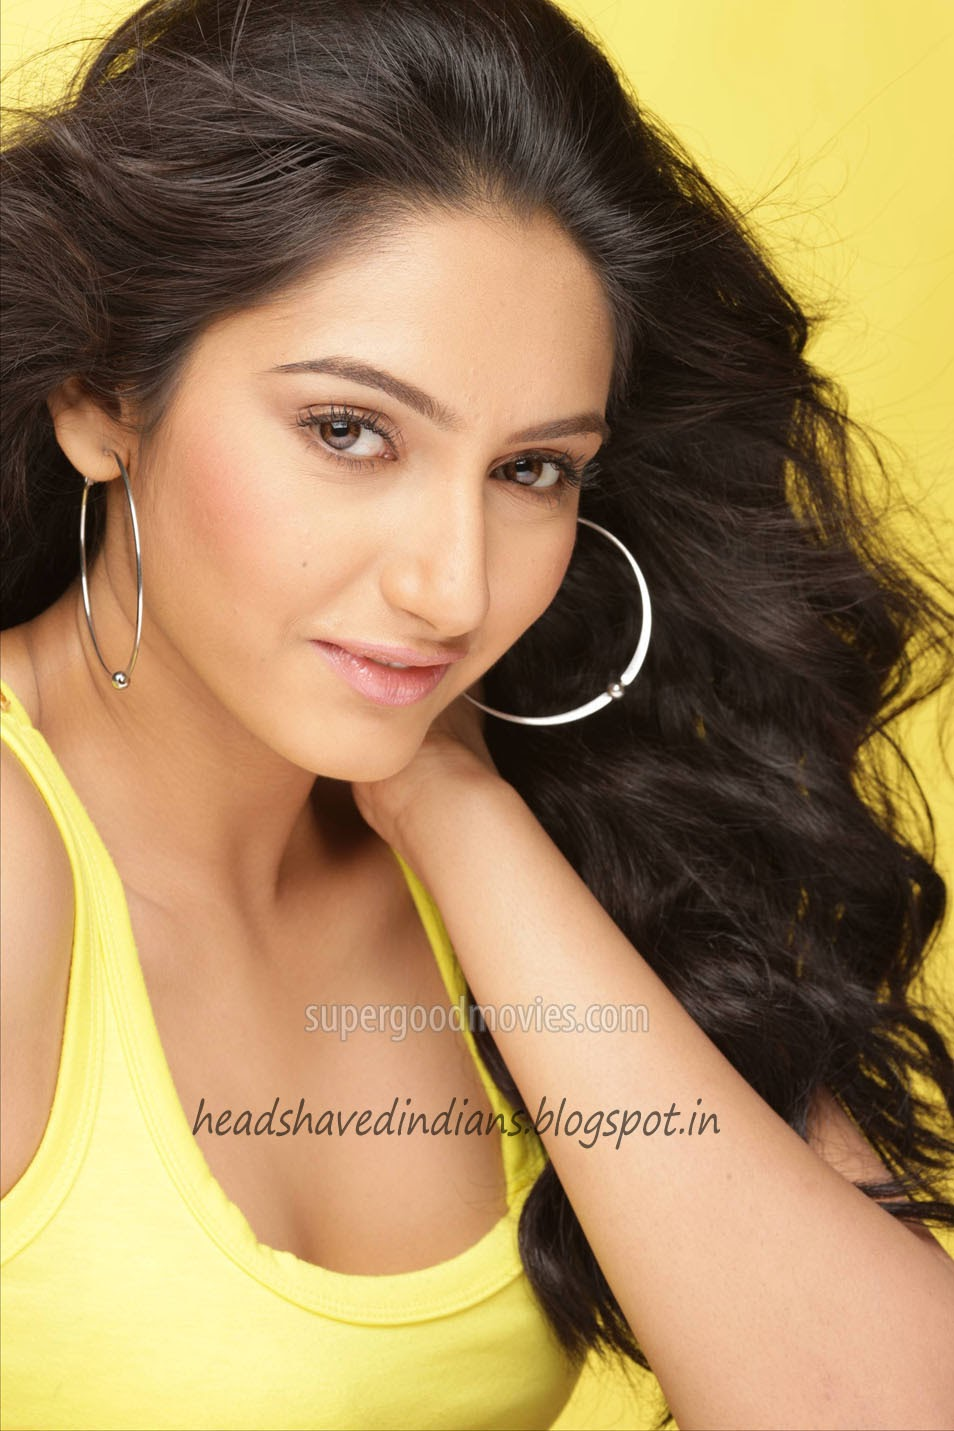 Kannada Actress Ragini Dwivedi Hot Photos Head Shaved